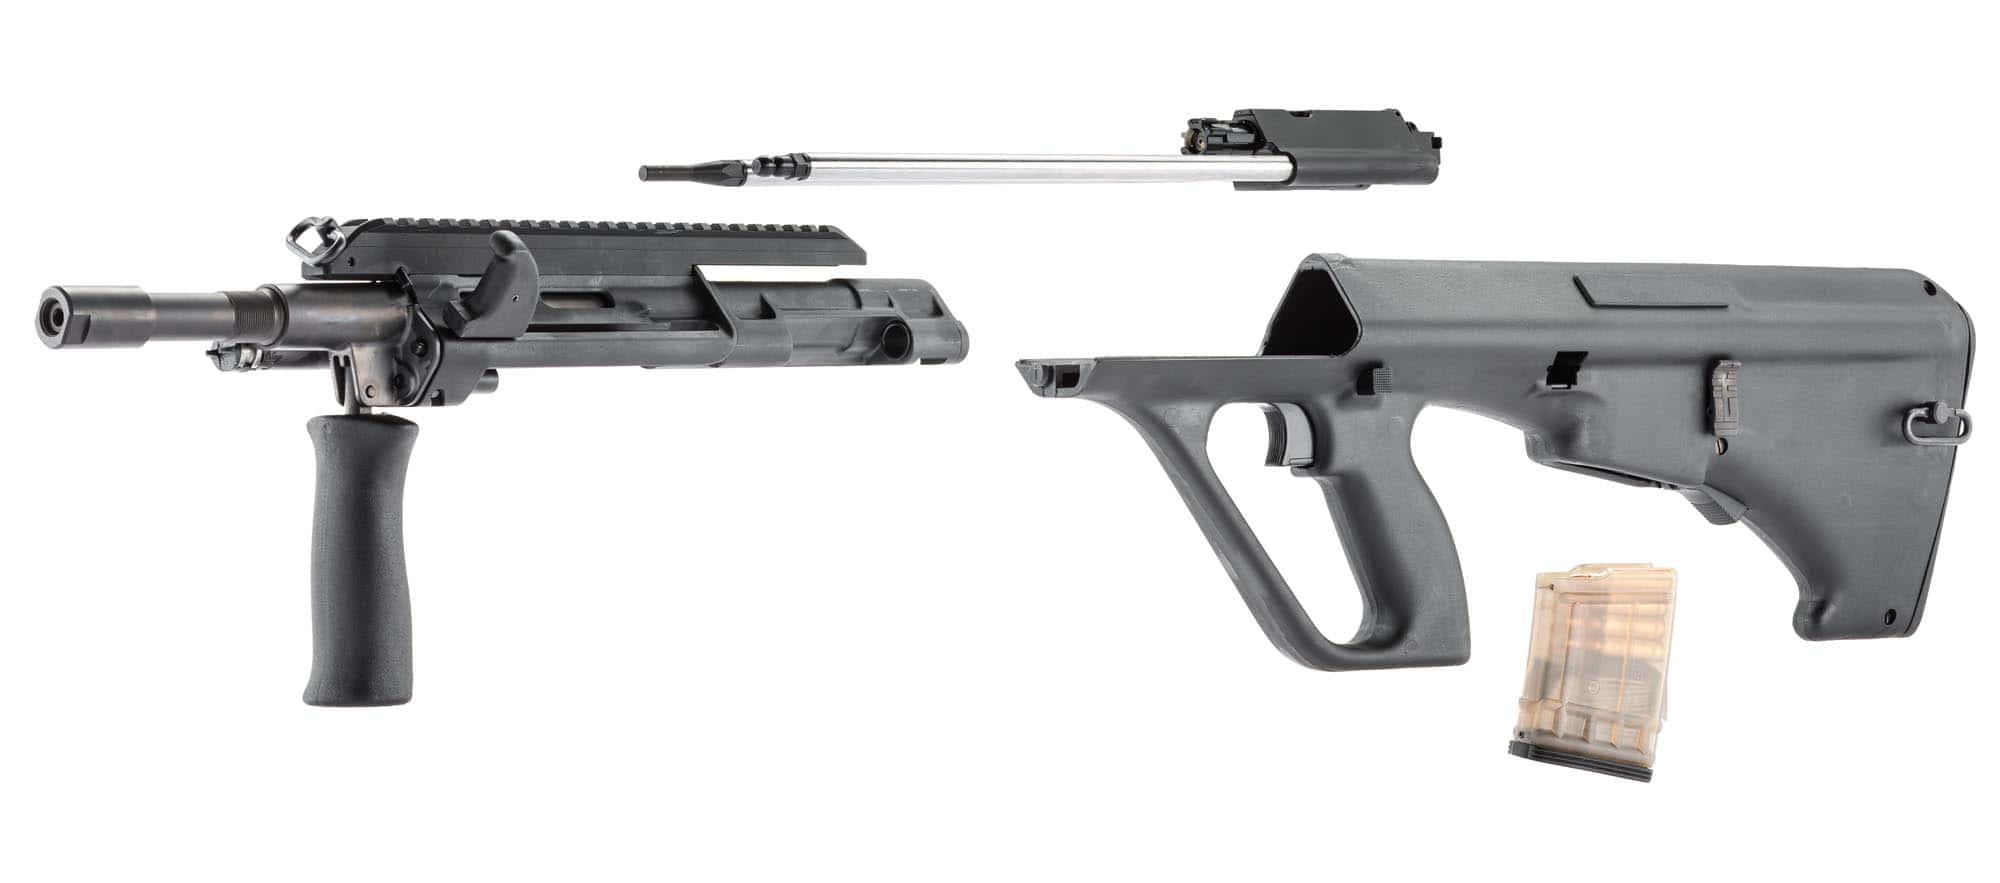 Semi automatic rifle Steyr Aug Z A3 cal  223 REM